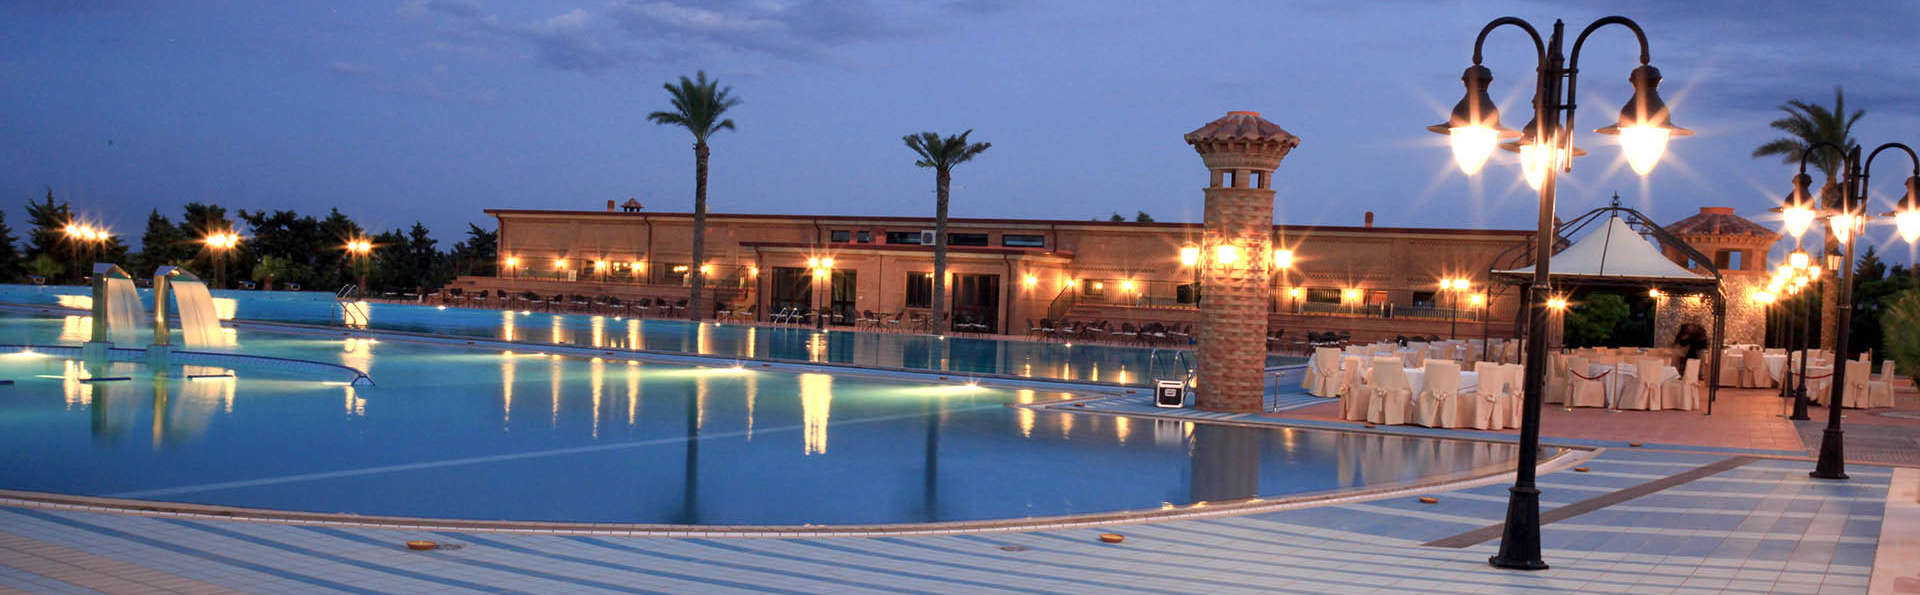 Grand Hotel Vigna Nocelli - EDIT_Panoramica_Pisc_01.jpg